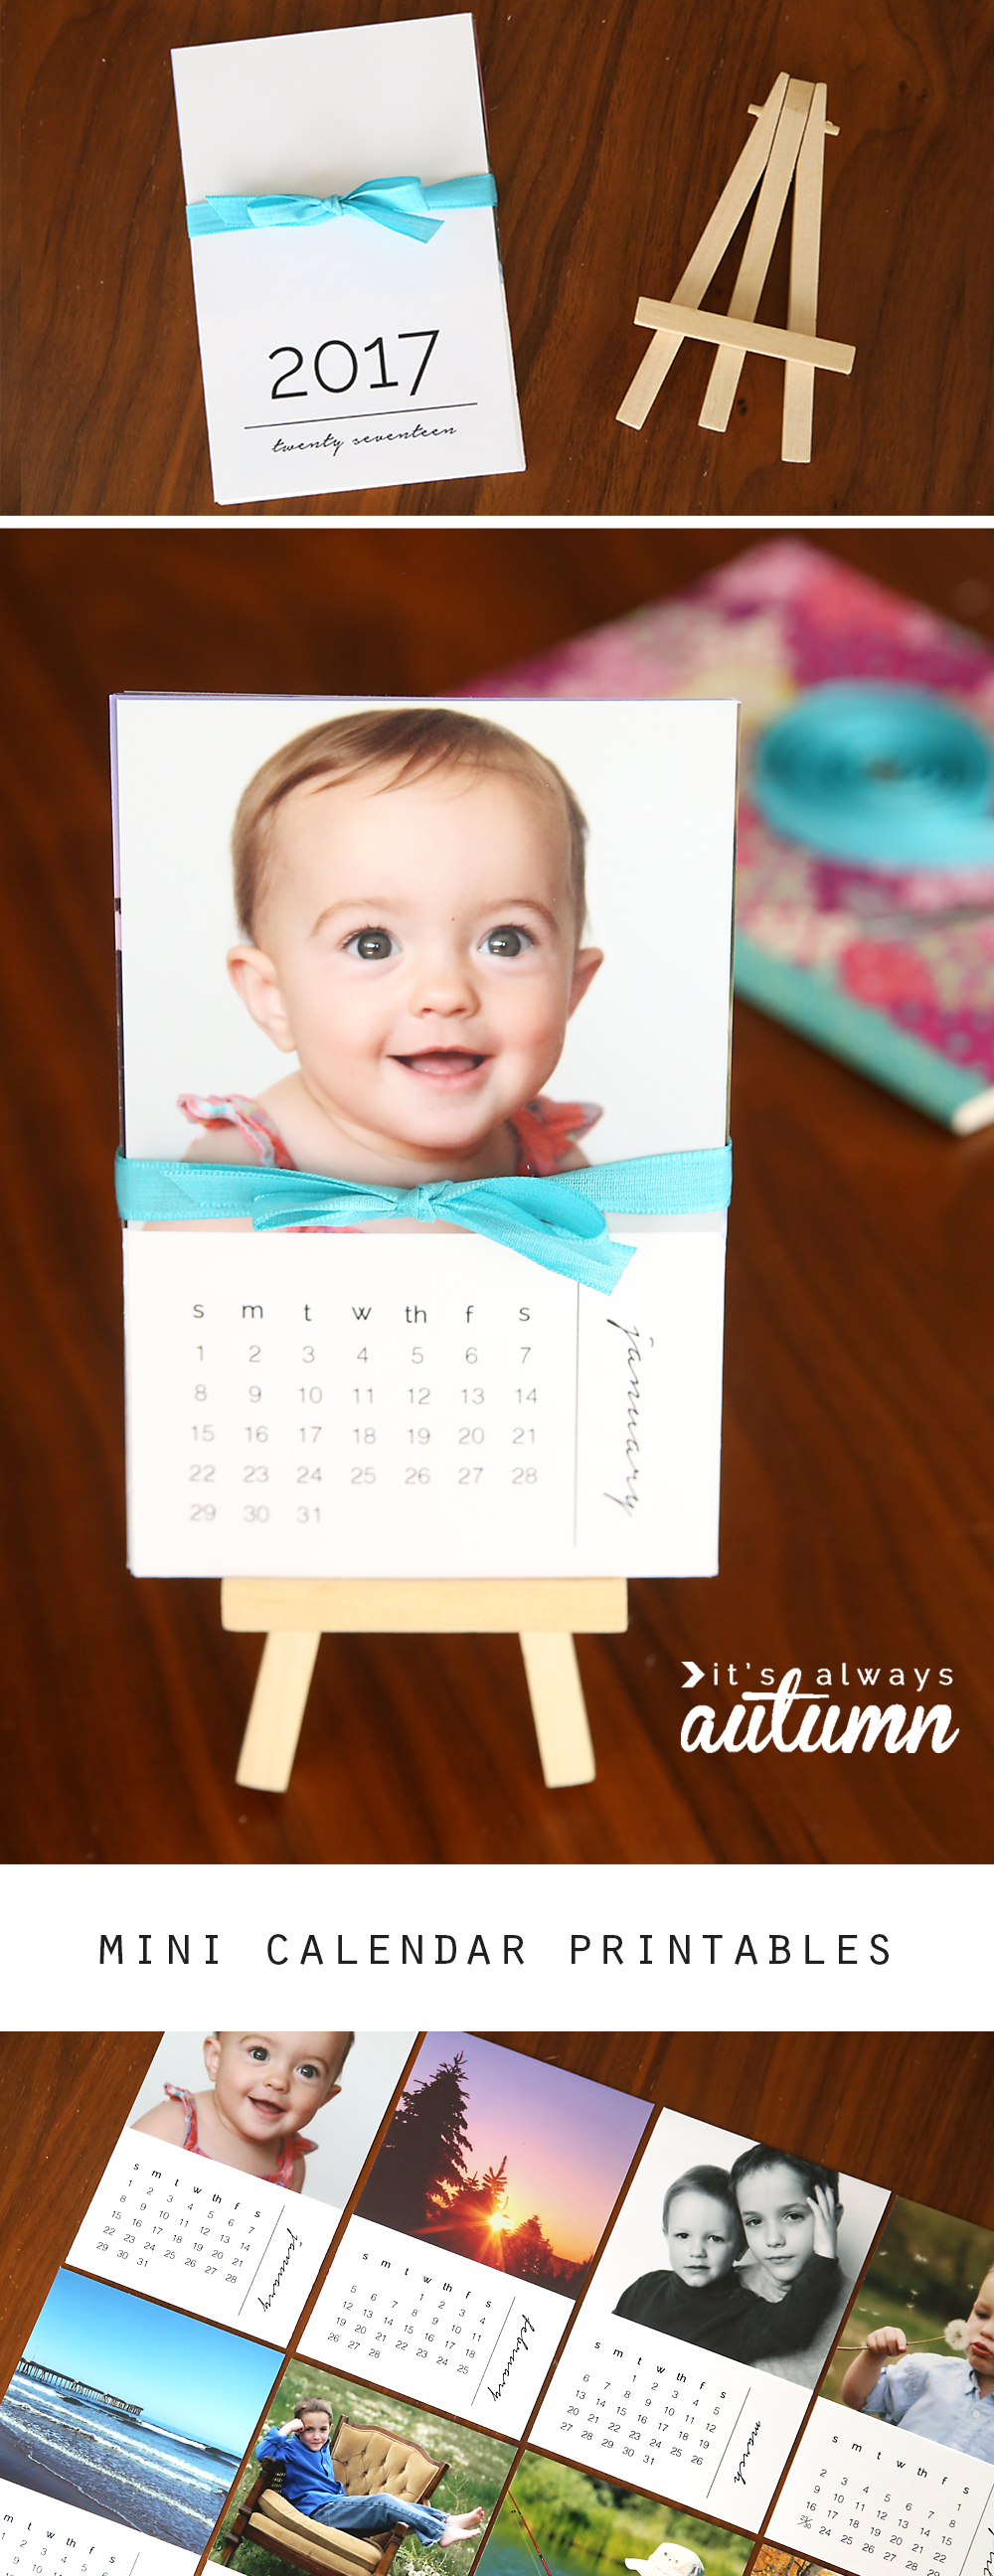 Diy Photo Calendar : Diy mini photo calendar w free printables it s always autumn